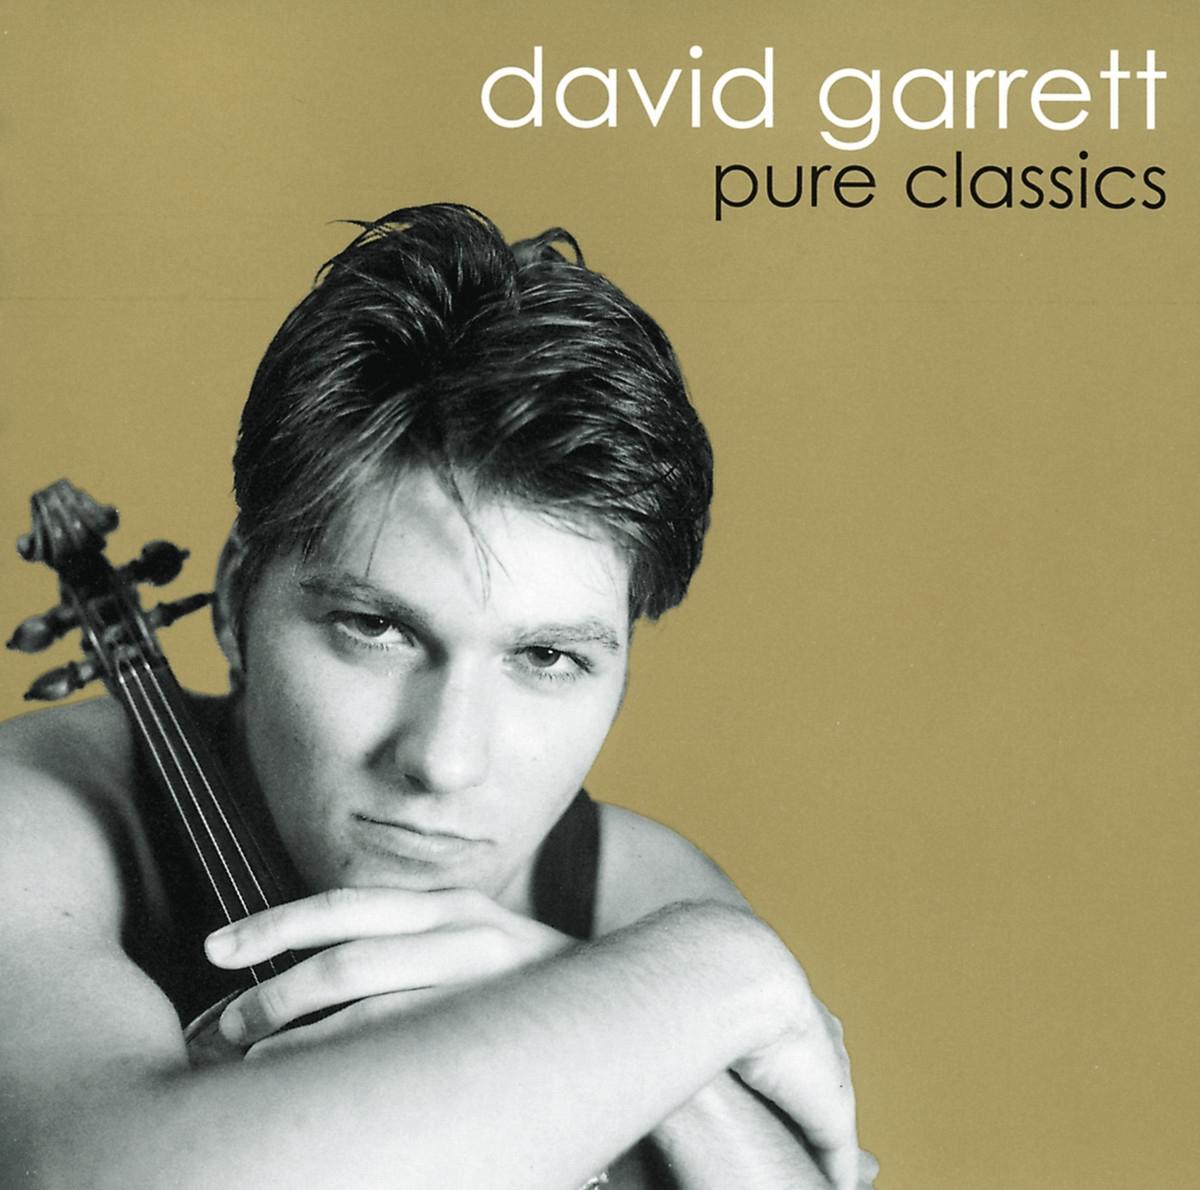 【David Garrett  音乐专辑】 - 南风 - 南 风 园  Music